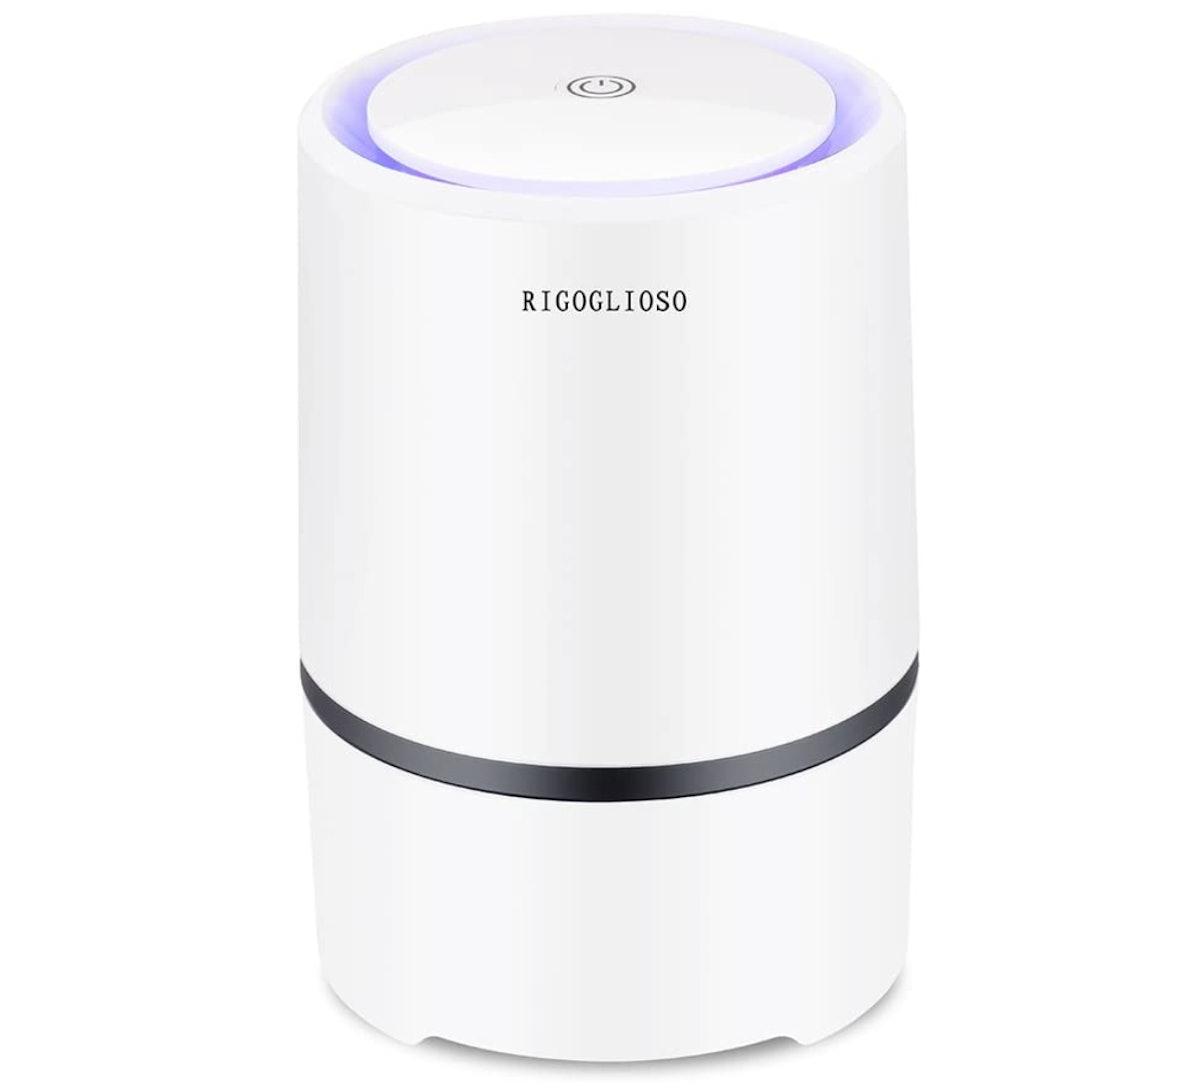 RIGOGLIOSO Air Purifier